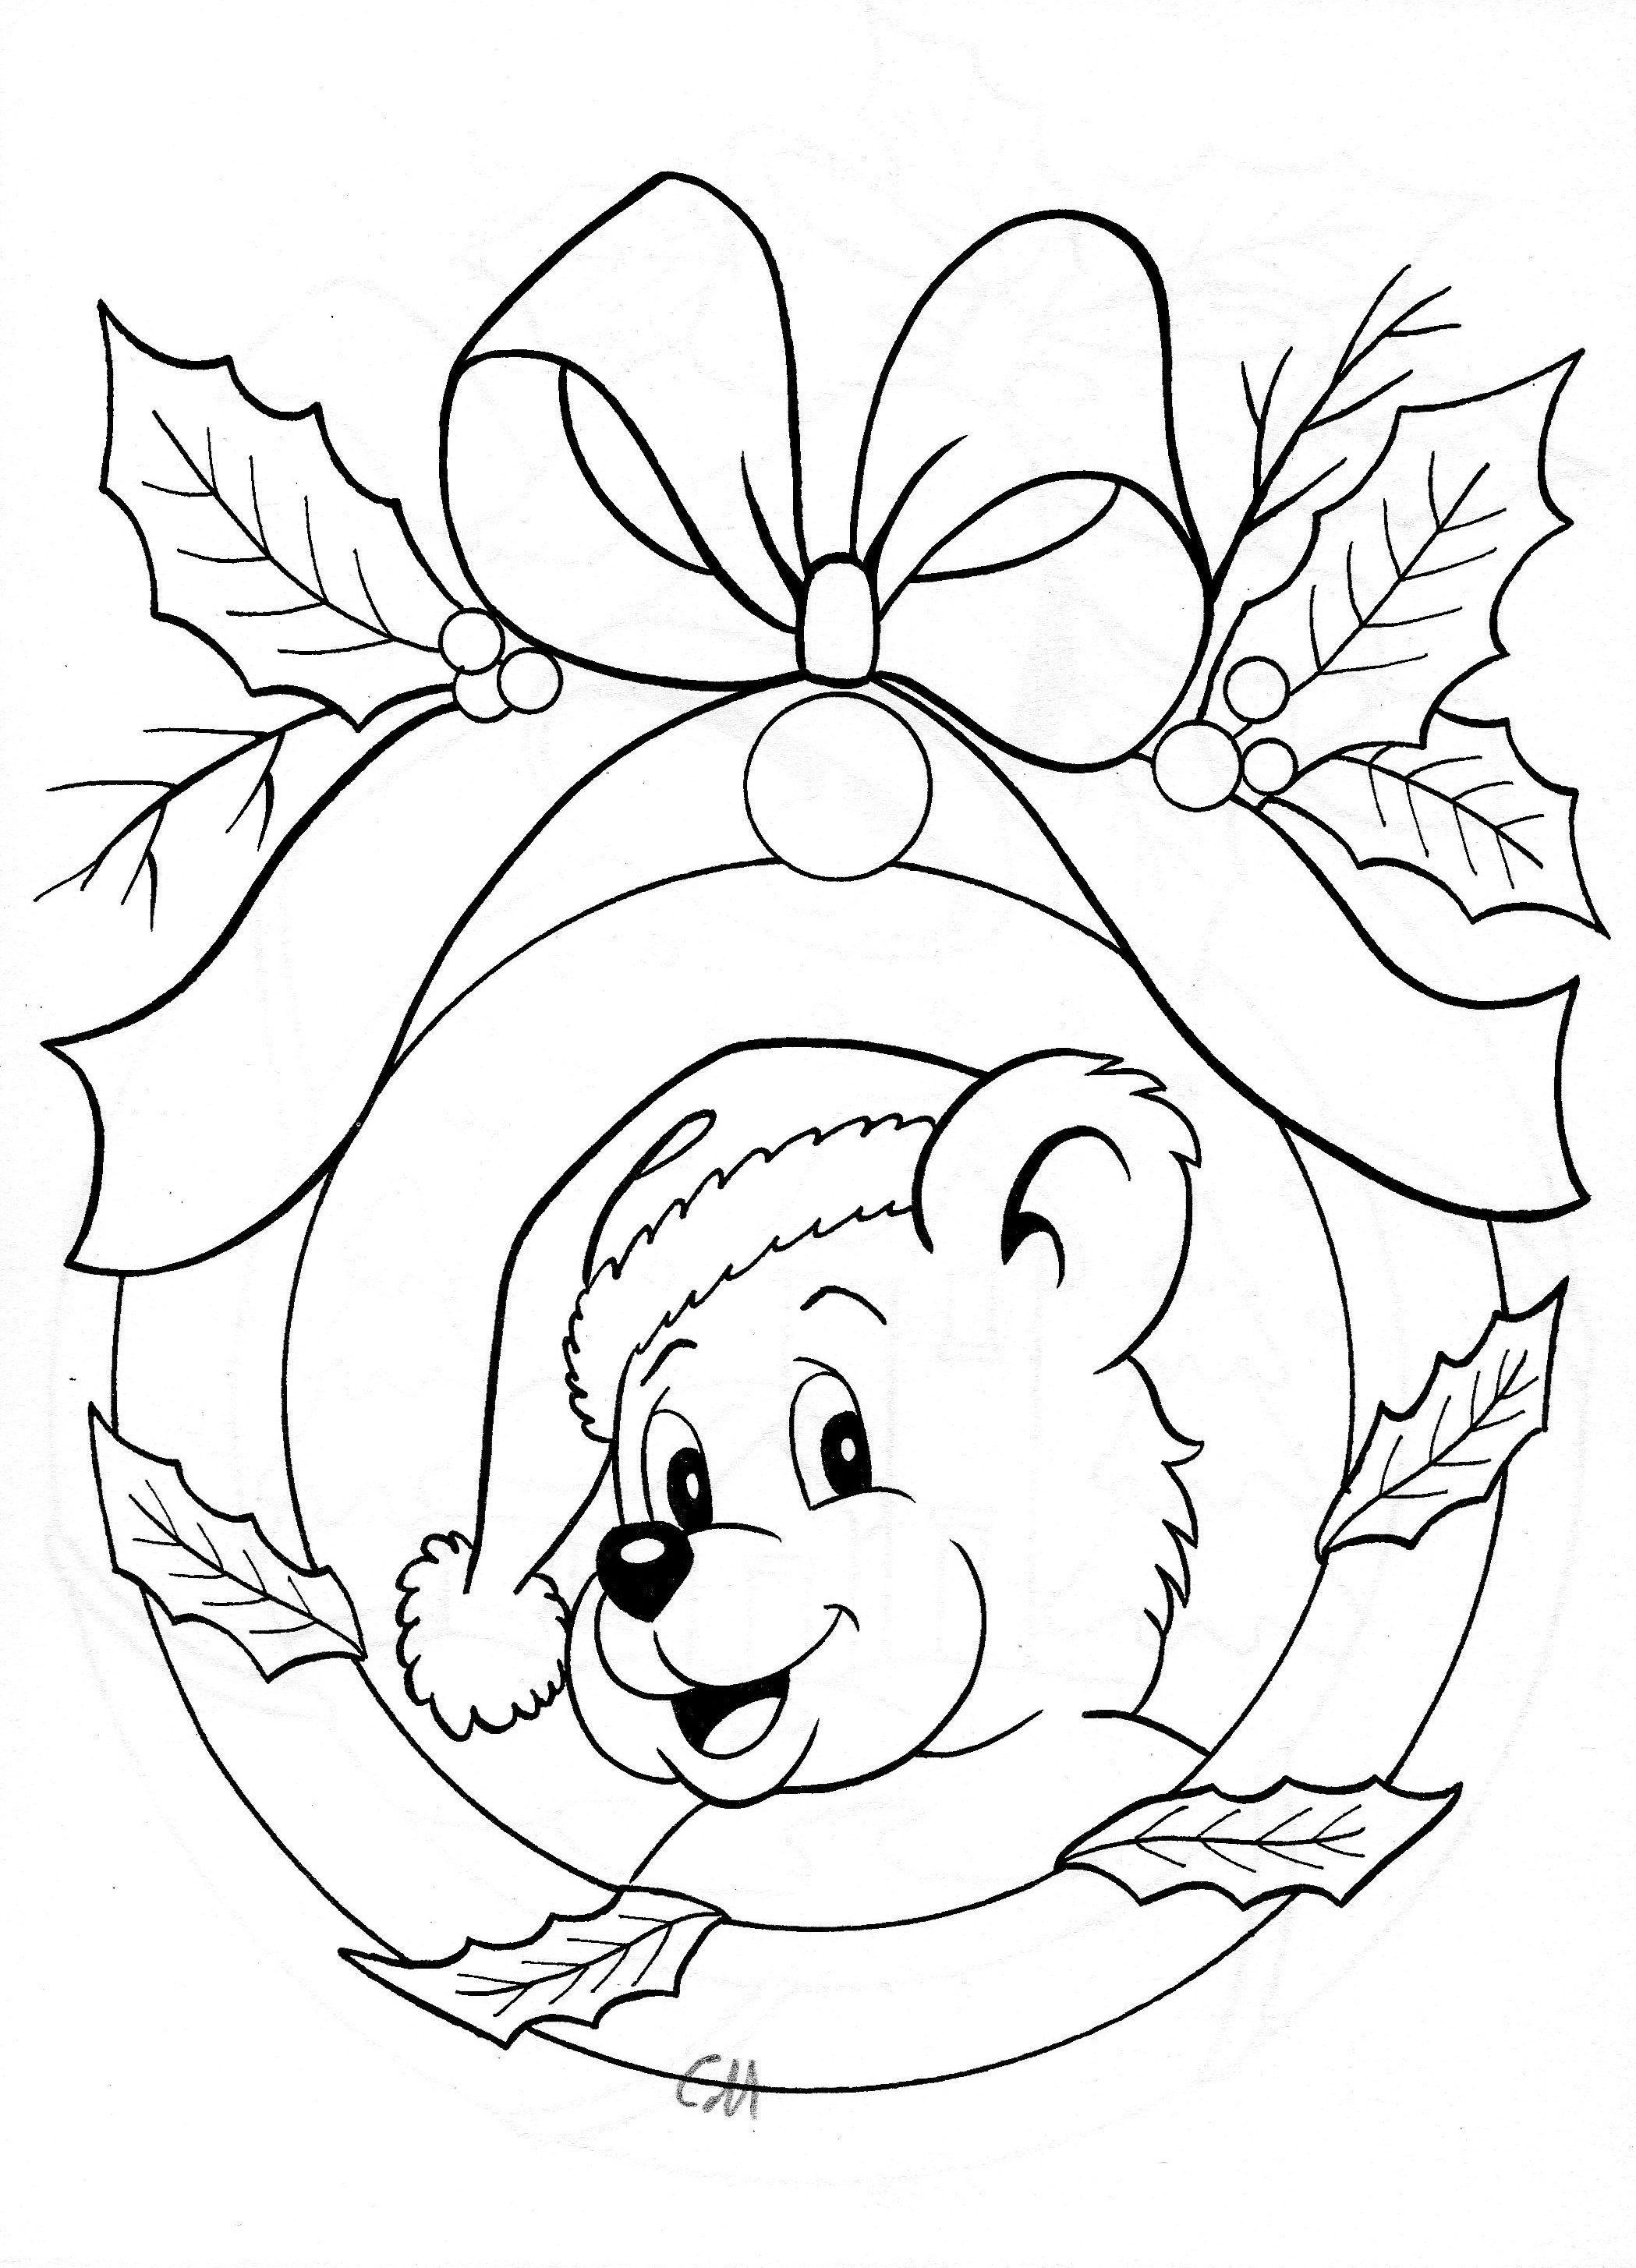 Great for an ornament | pergamino | Pinterest | Dibujos para pintar ...